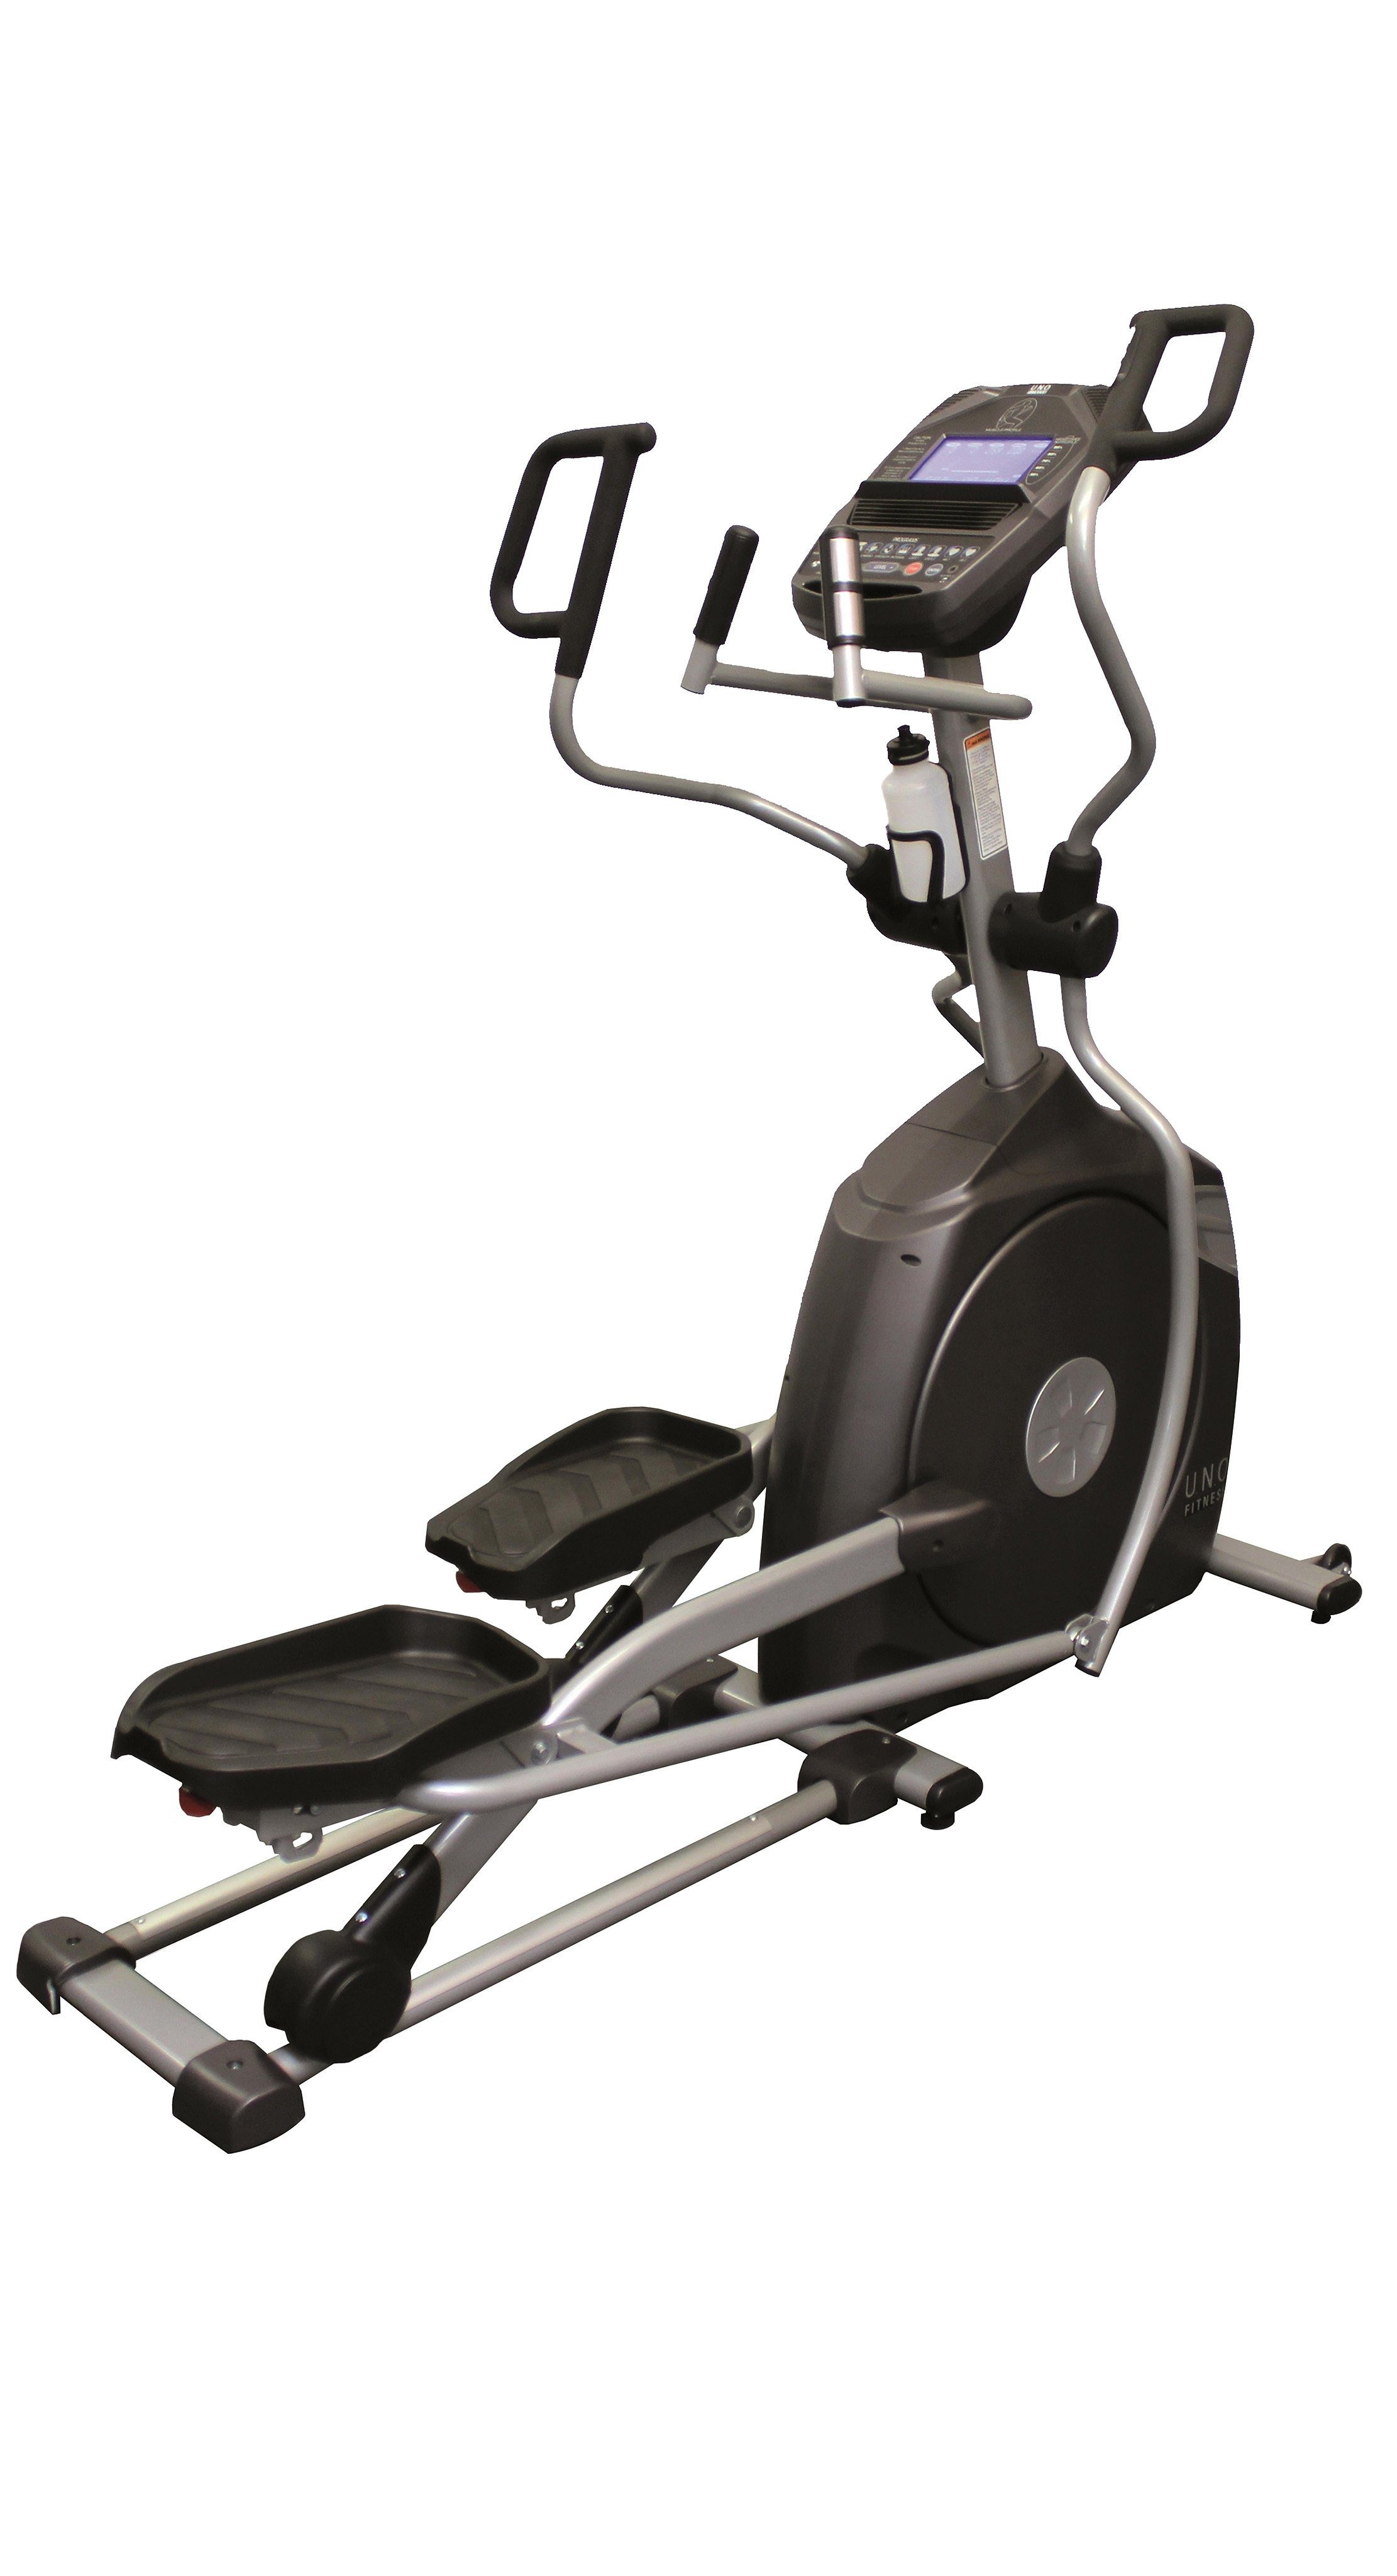 U.N.O. Fitness UNO FITNESS Crosstrainer-Ergometer Crosstrainer XE 50 Technik & Freizeit/Sport & Freizeit/Fitnessgeräte/Crosstrainer